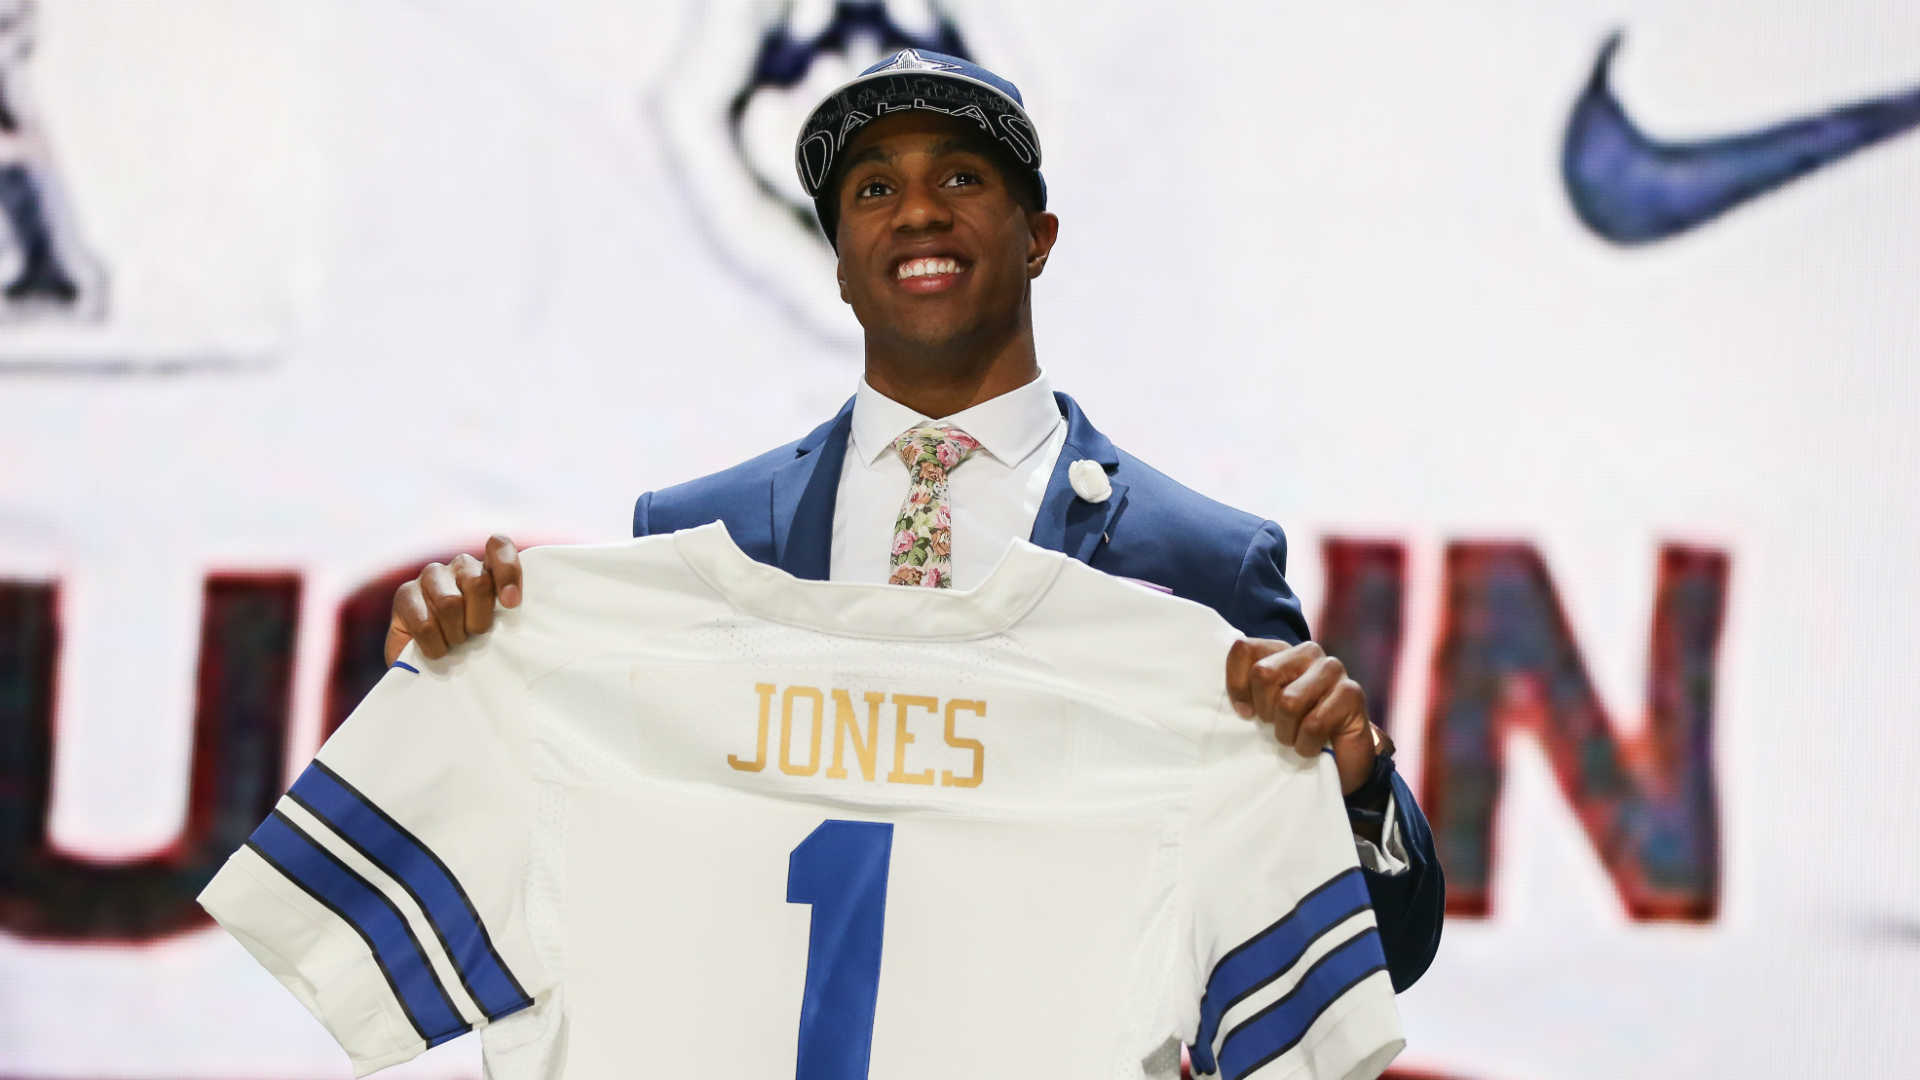 Cowboys first round pick Byron Jones injured in practice